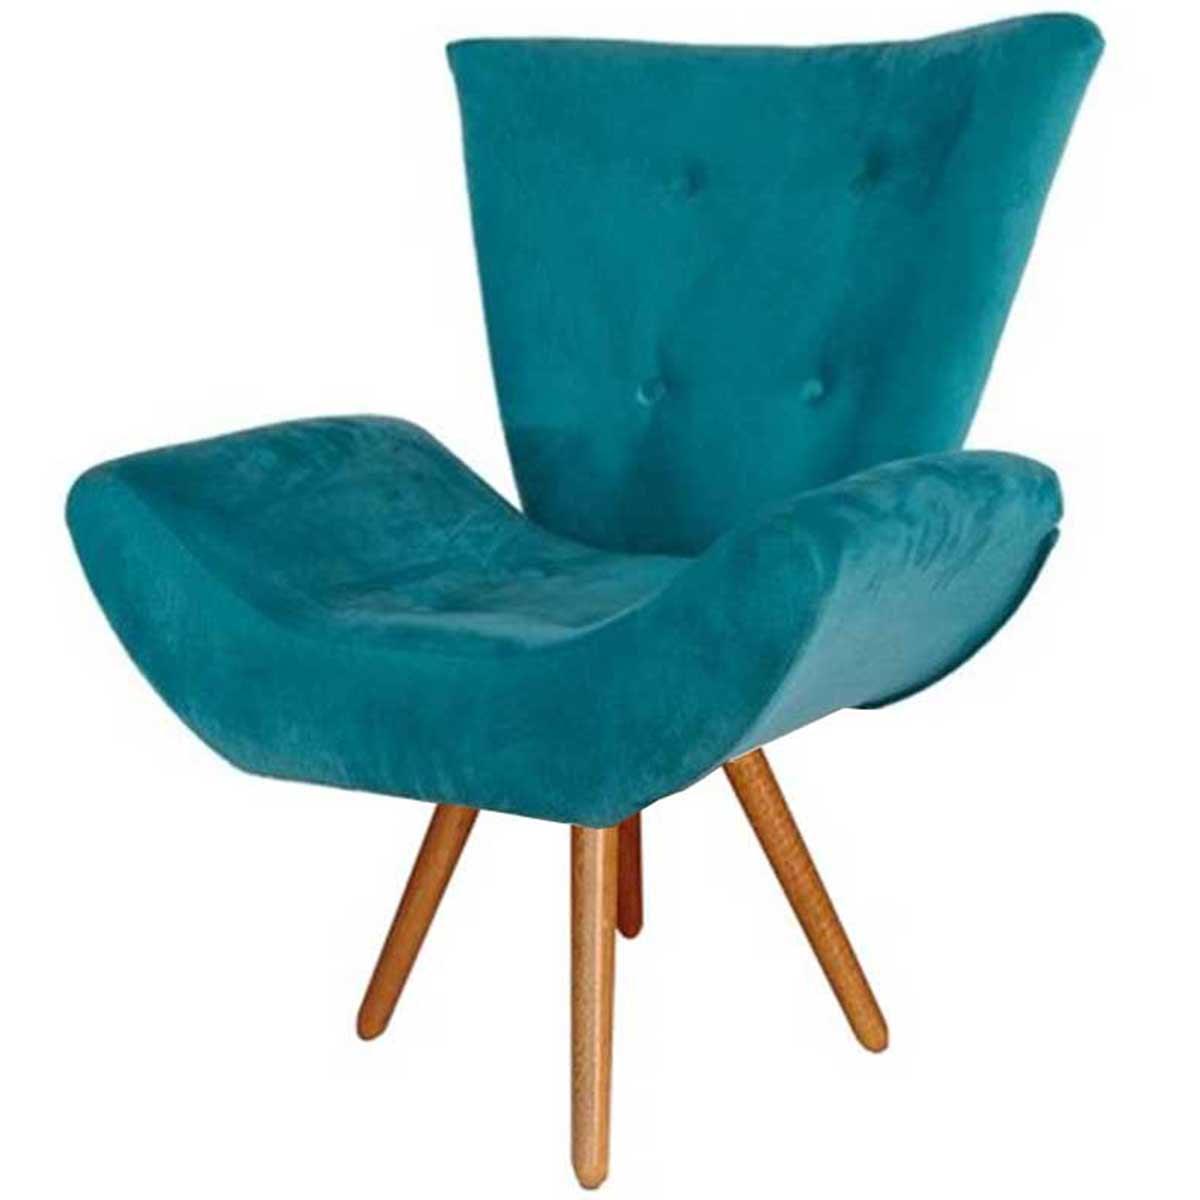 Poltrona Decorativa Diana Tavares Animale Azul Turquesa